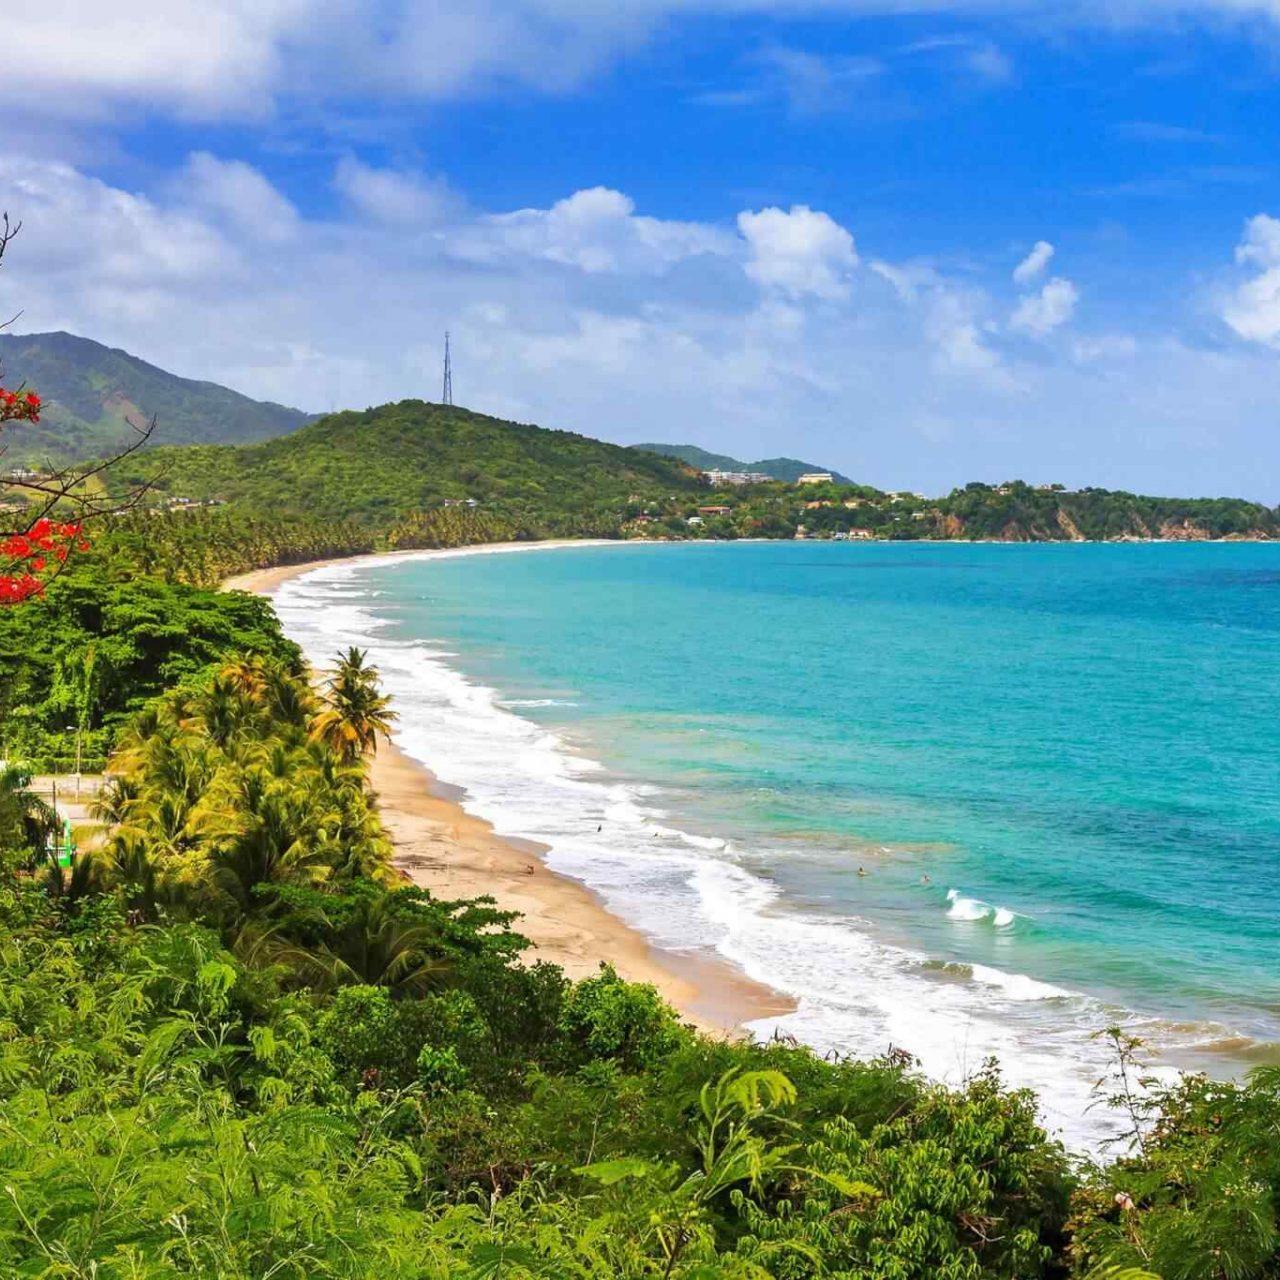 https://www.secomitravel.ro/wp-content/uploads/2018/09/destination-puerto-rico-01-1280x1280.jpg